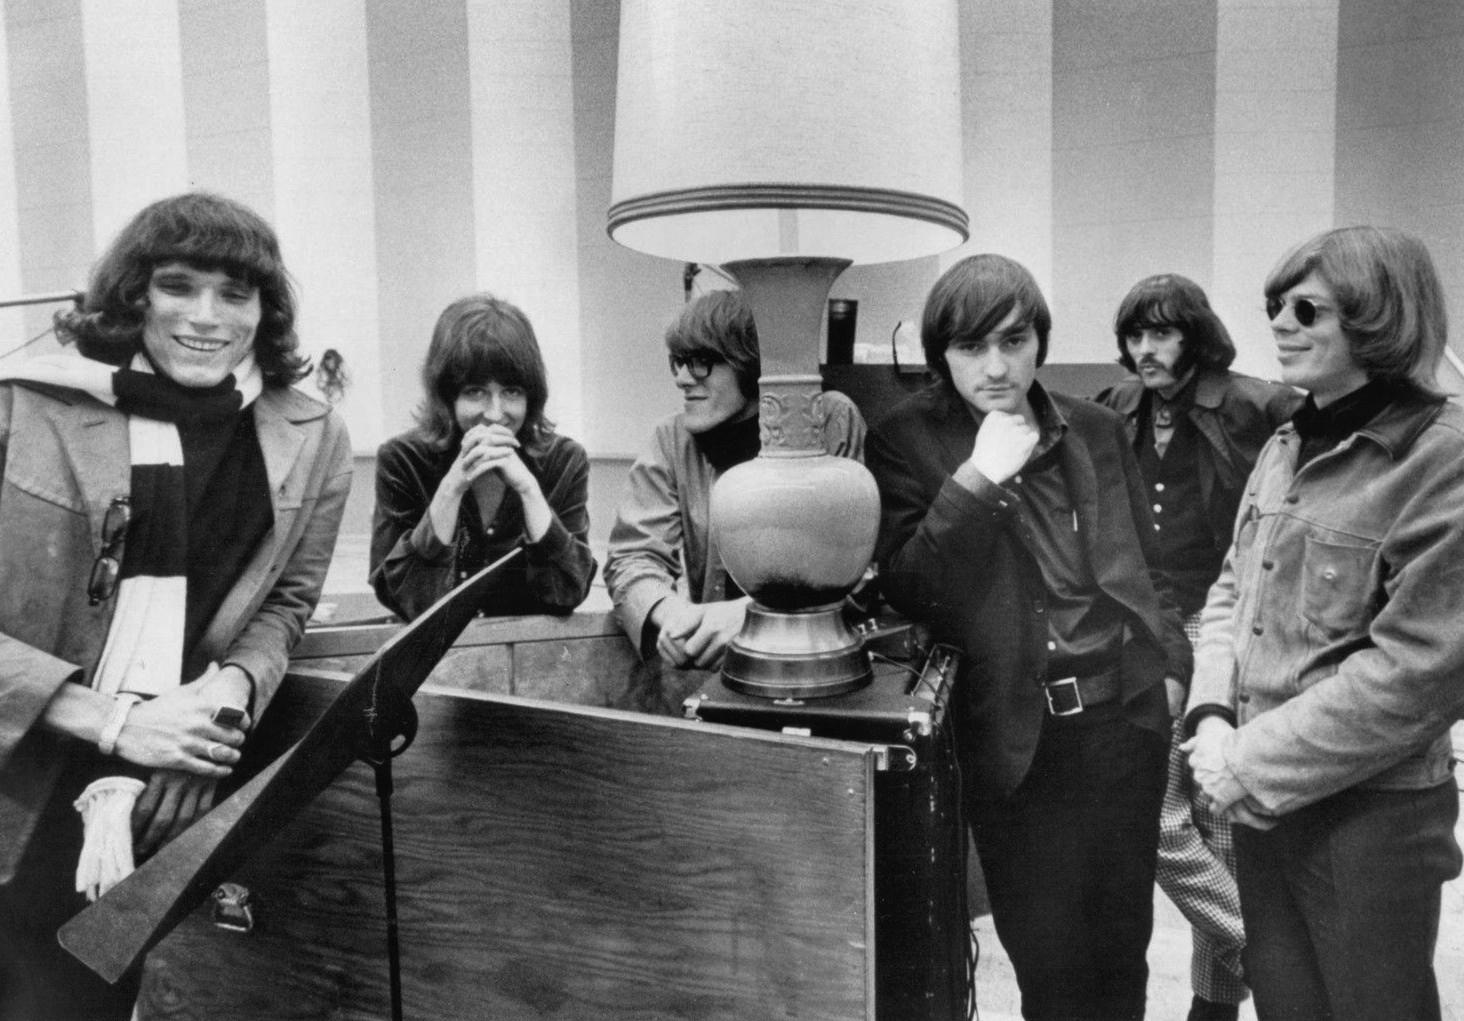 Jefferson Airplane en 1970. De gauche à droite : Jorma Kaukonen, Grace Slick, Paul Kantner, Marty Balin, Spencer Dryden et Jack Casady